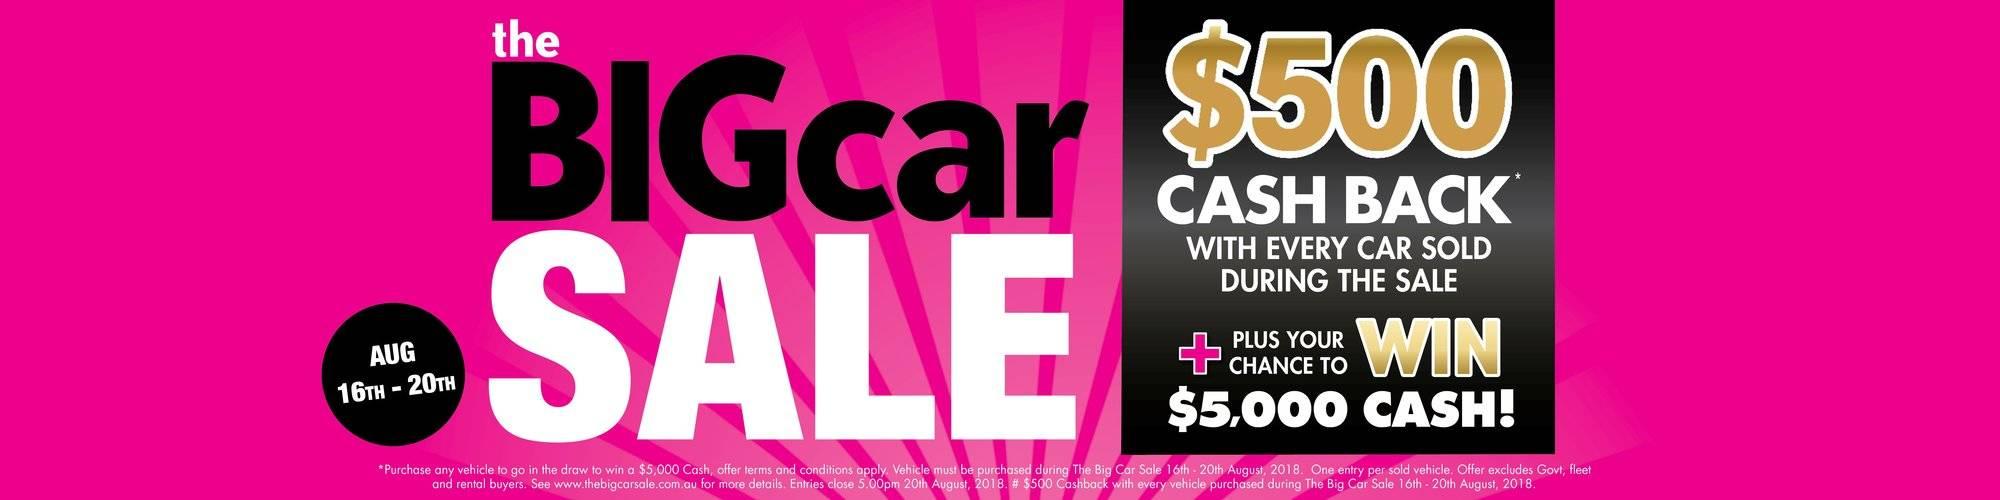 Big Car Sale